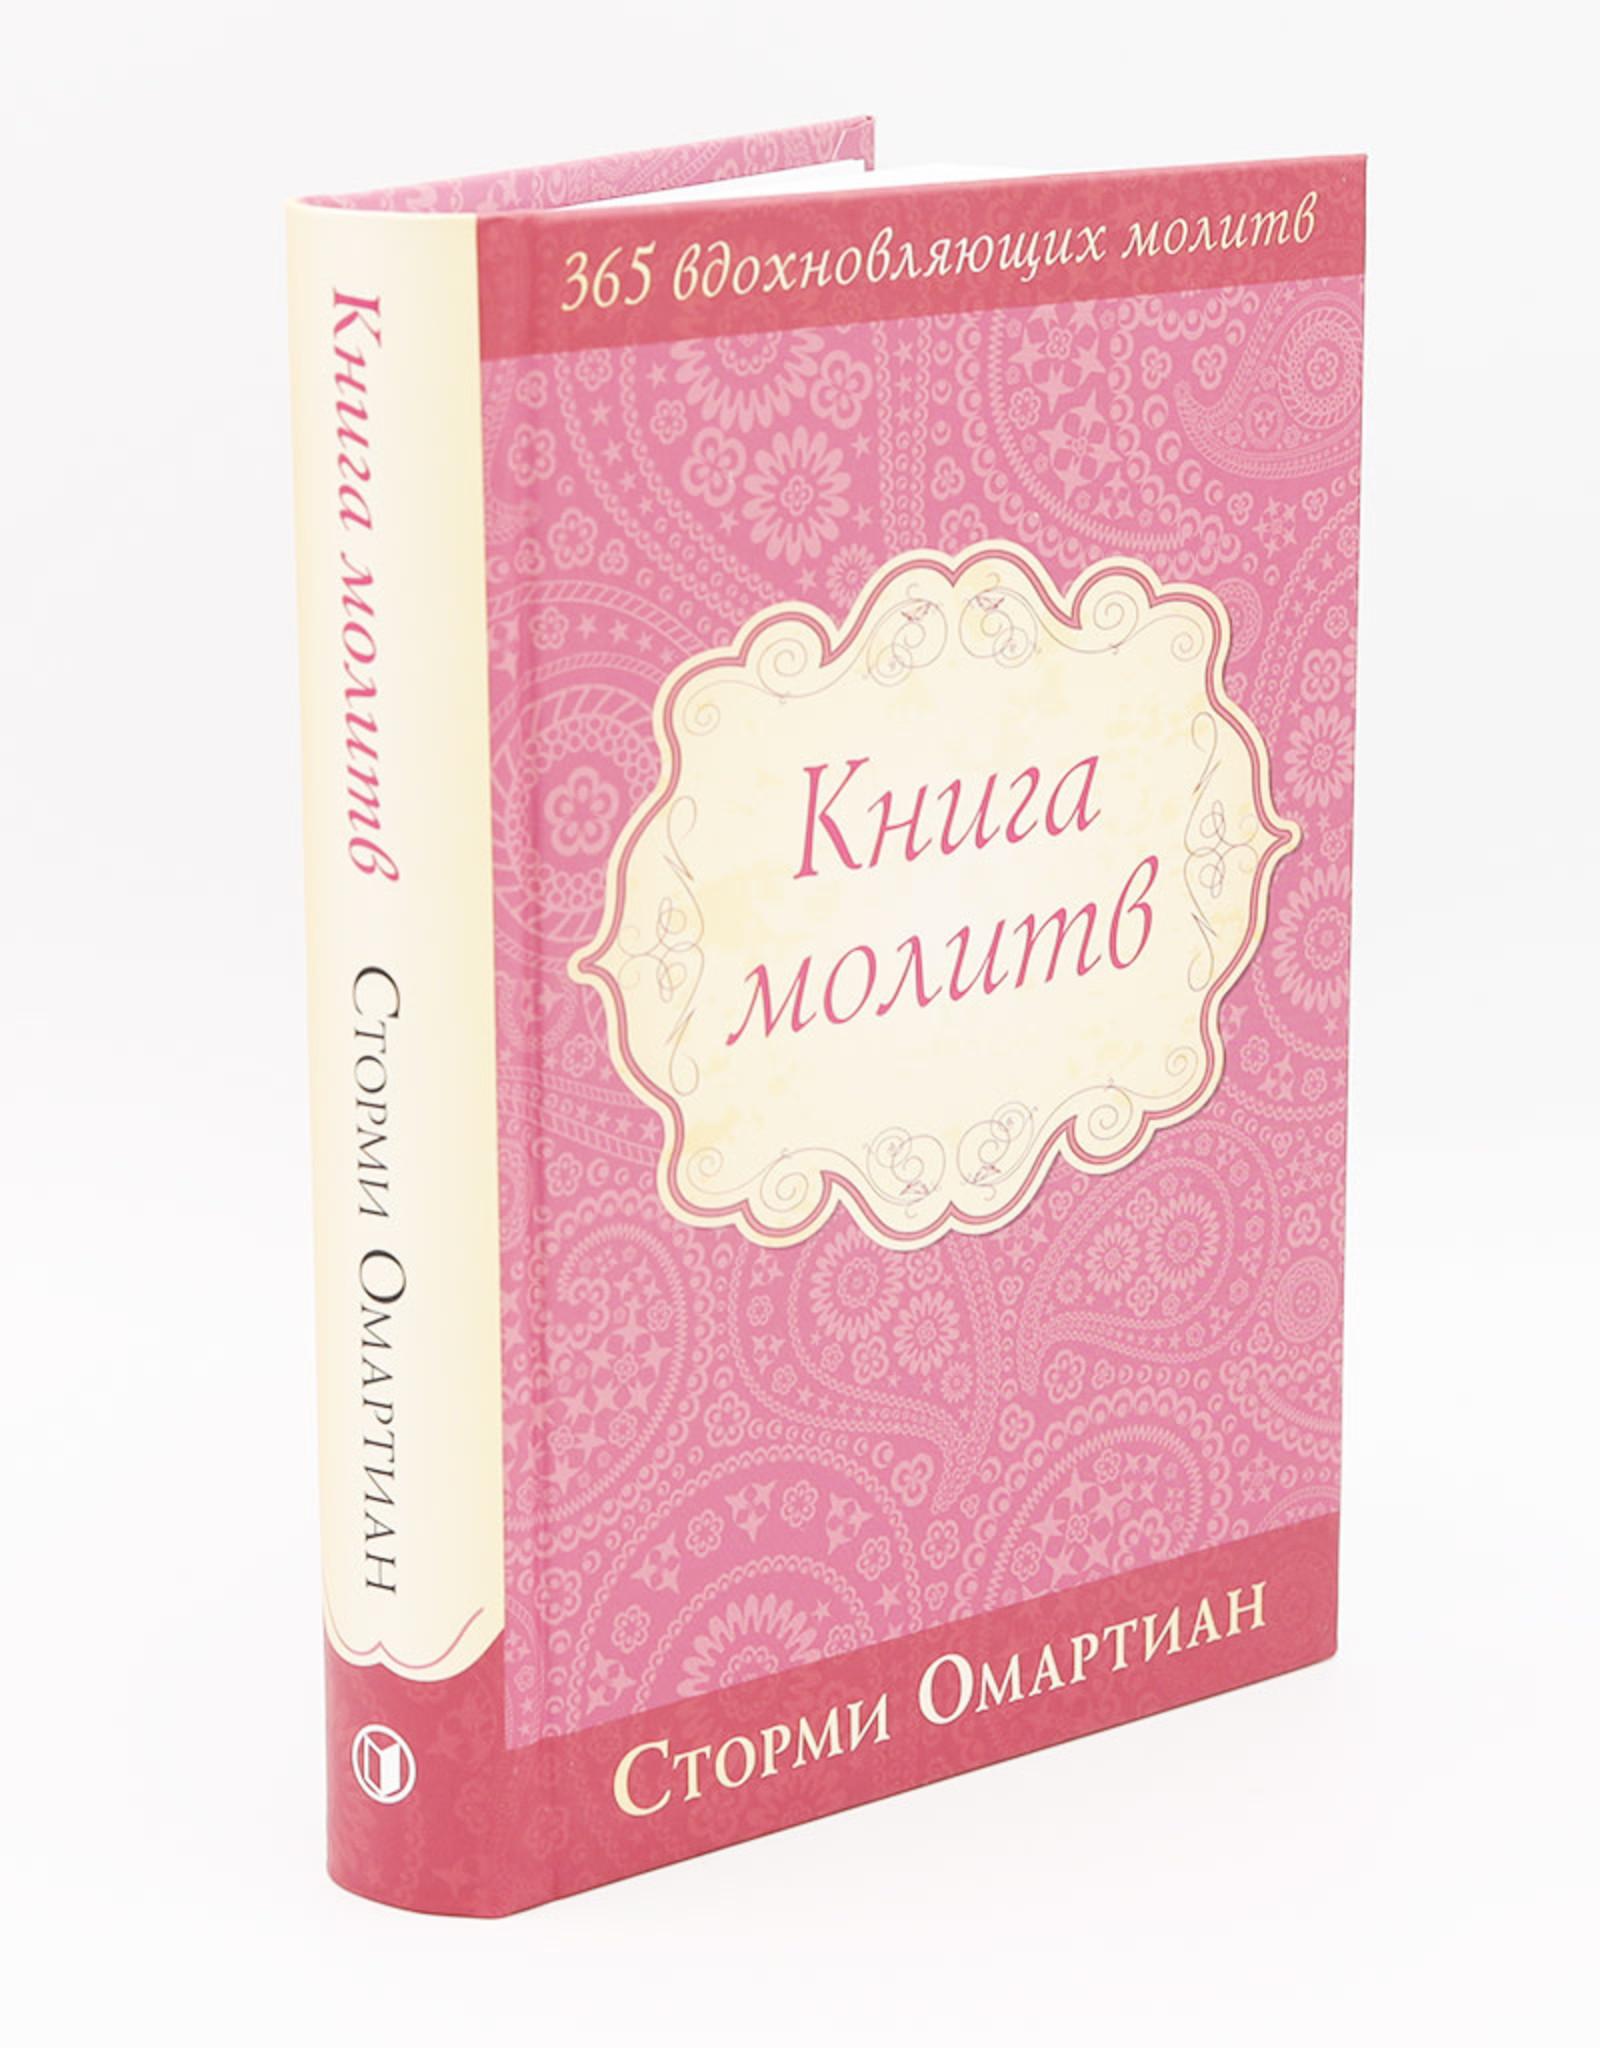 Книга Молитв